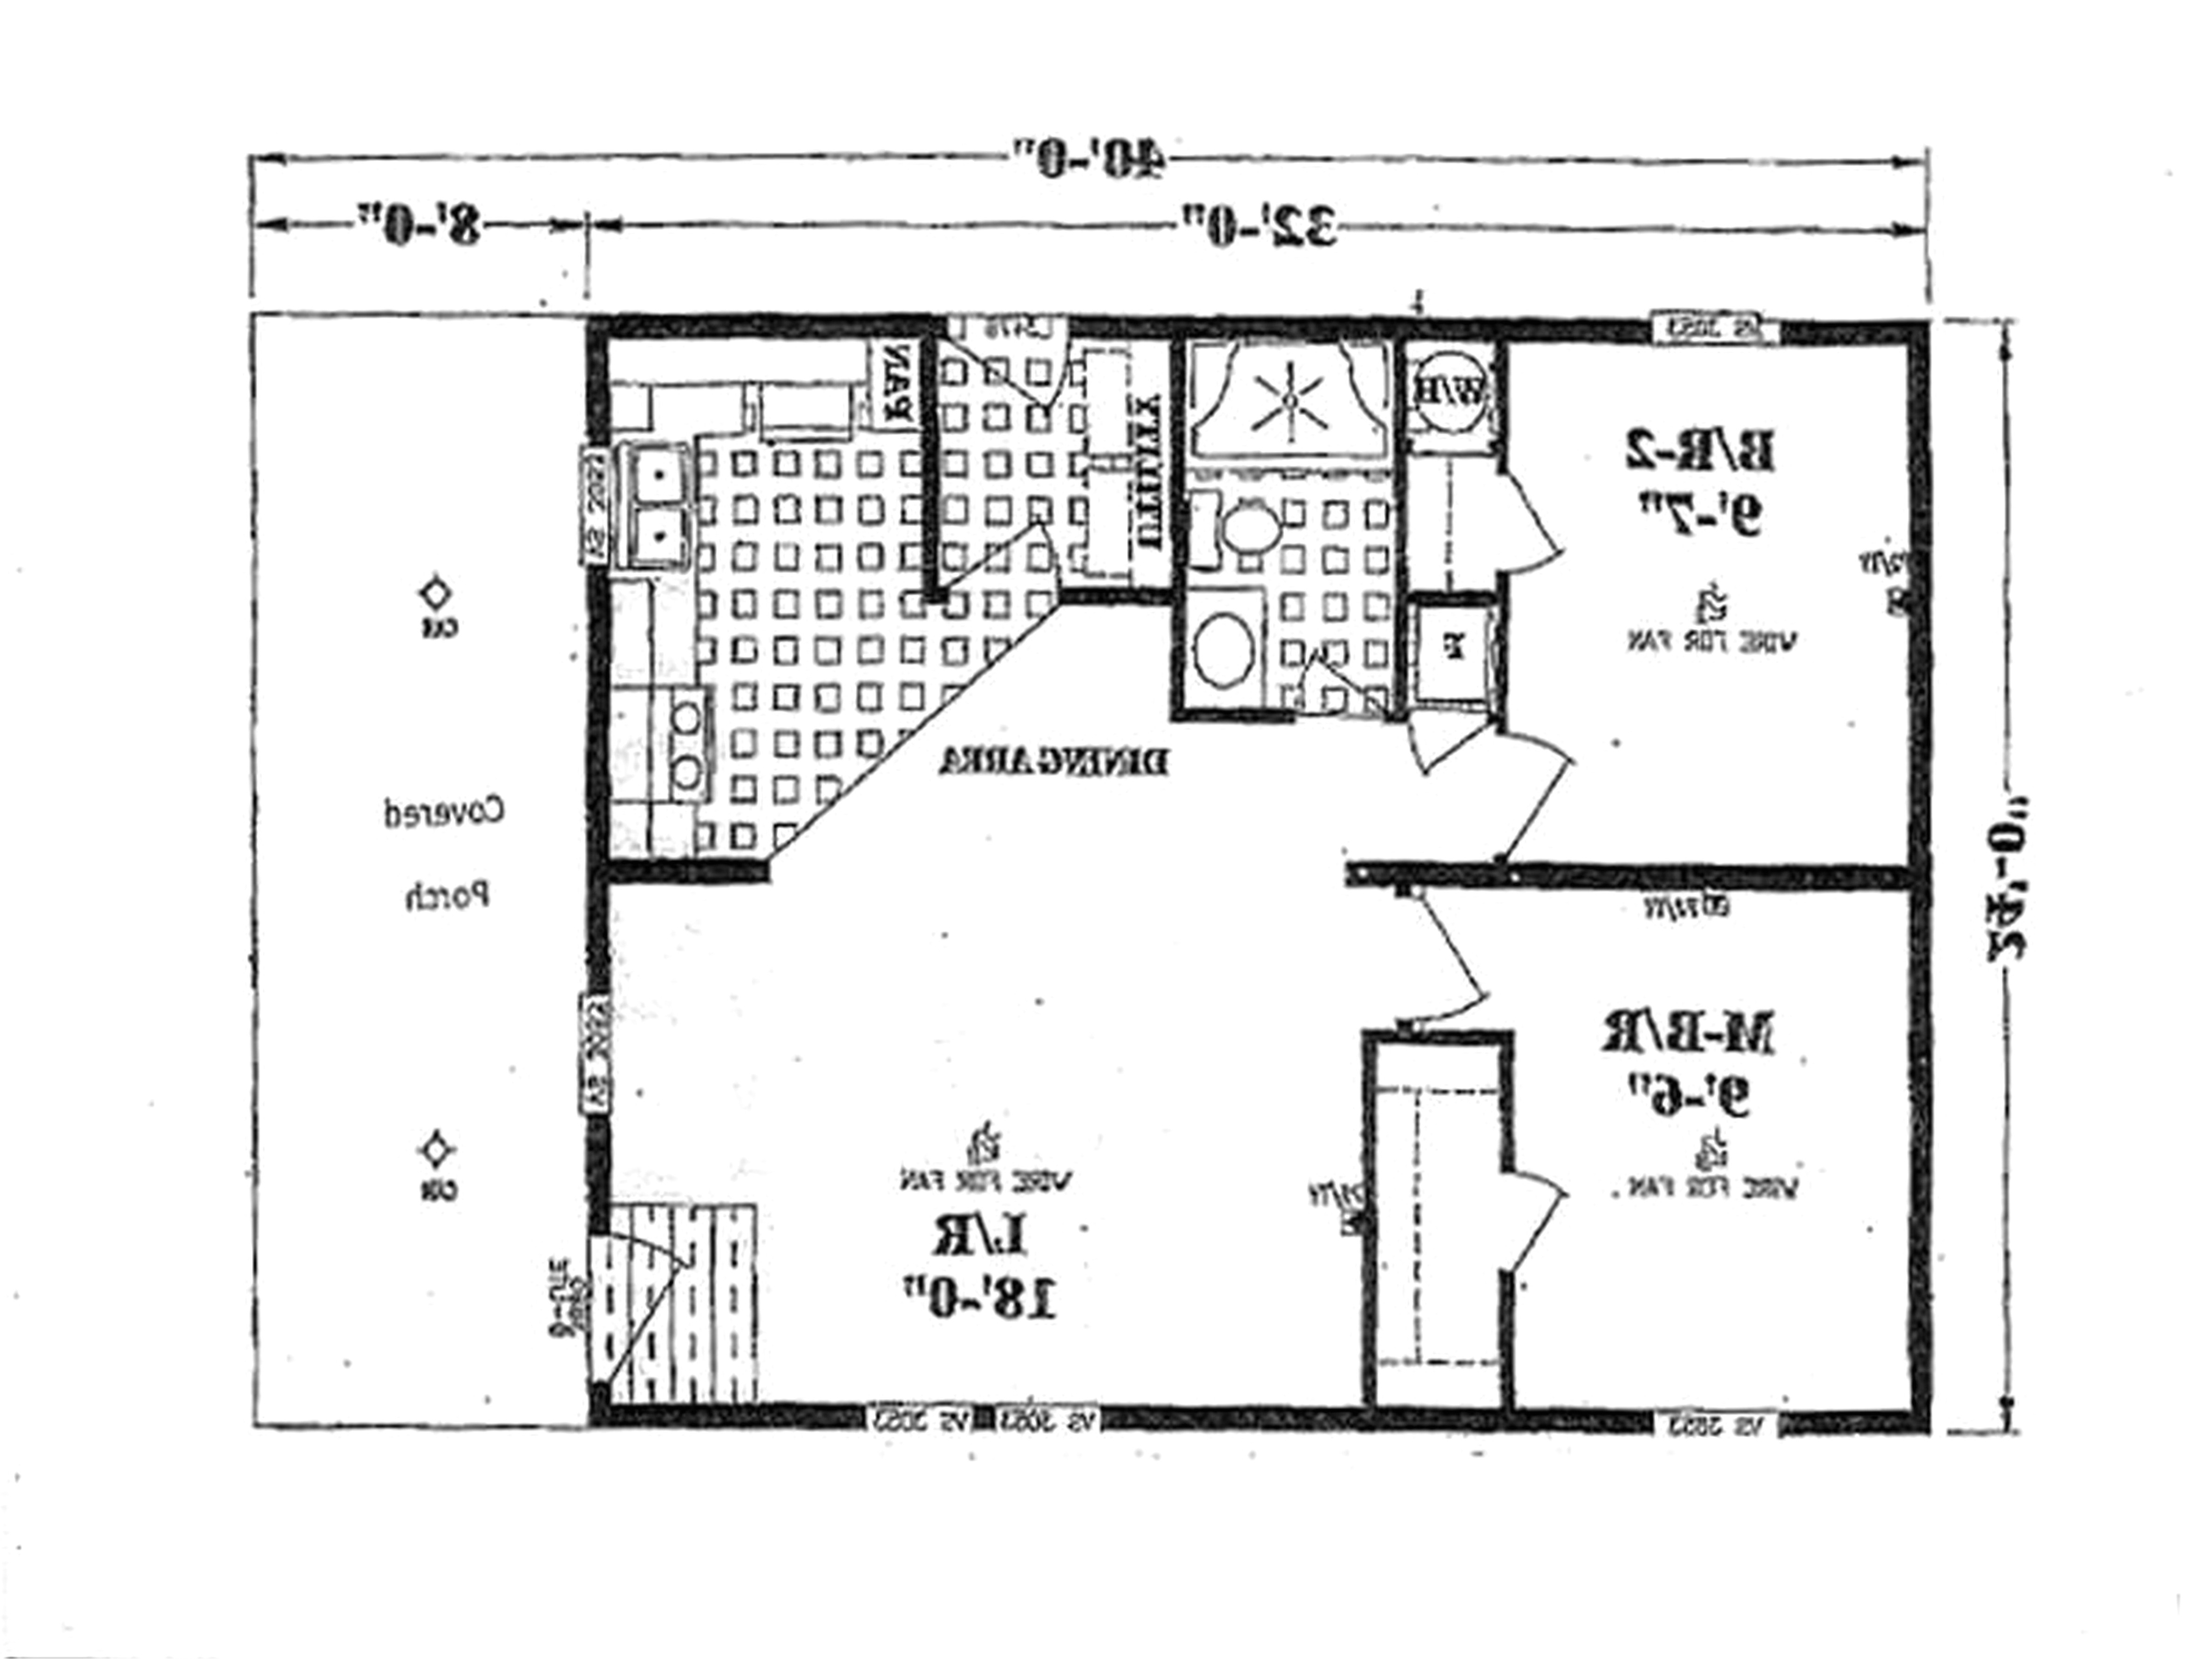 20 elegant oak creek homes floor plans oak creek homes floor plans best of oak creek